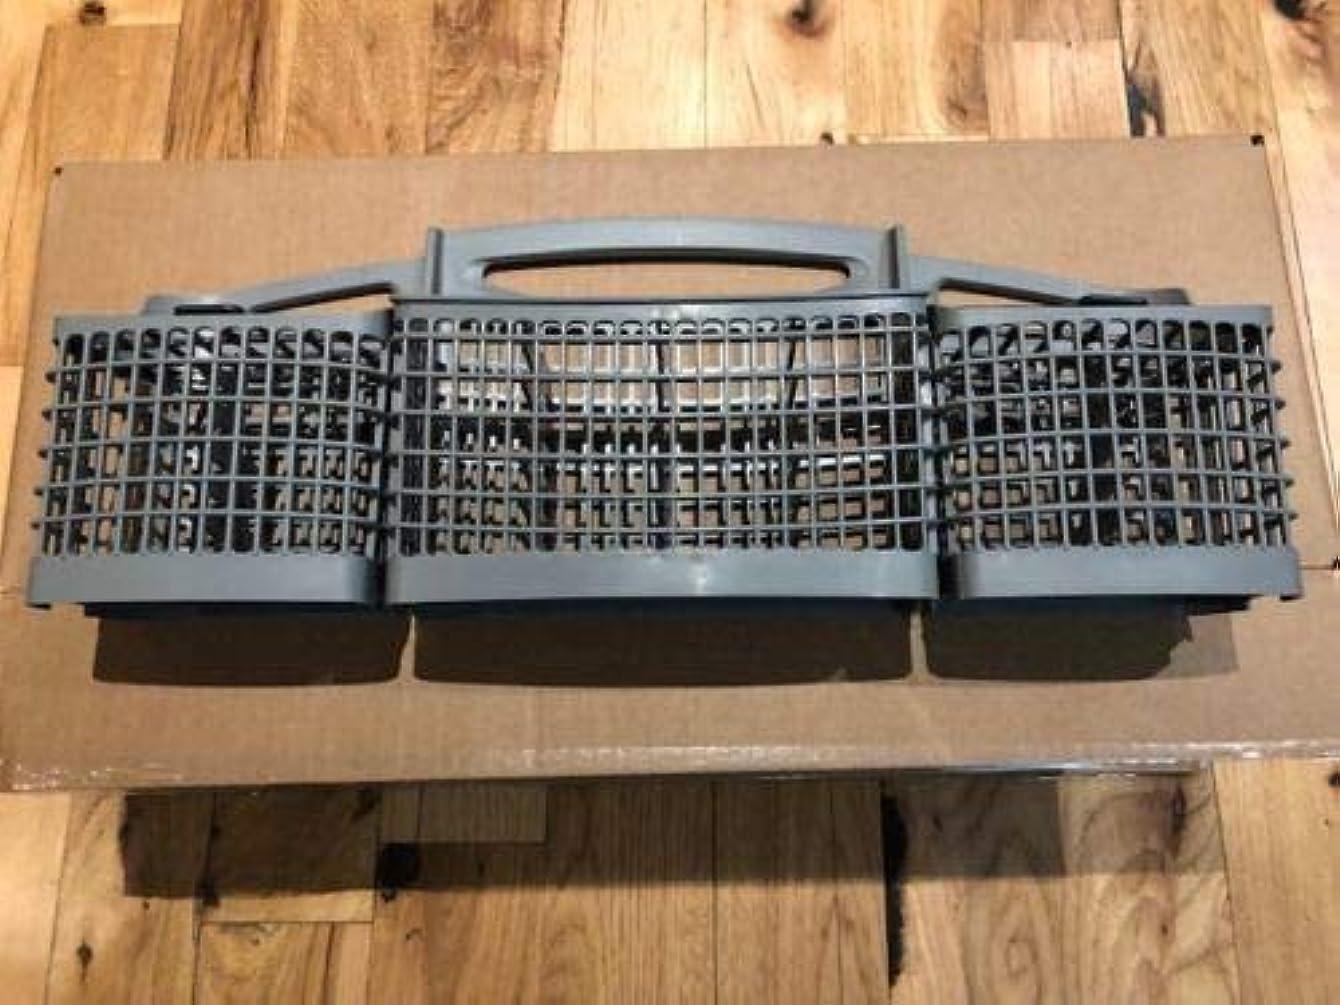 5304507404 For Electrolux Frigidaire Dishwasher Silverware Basket